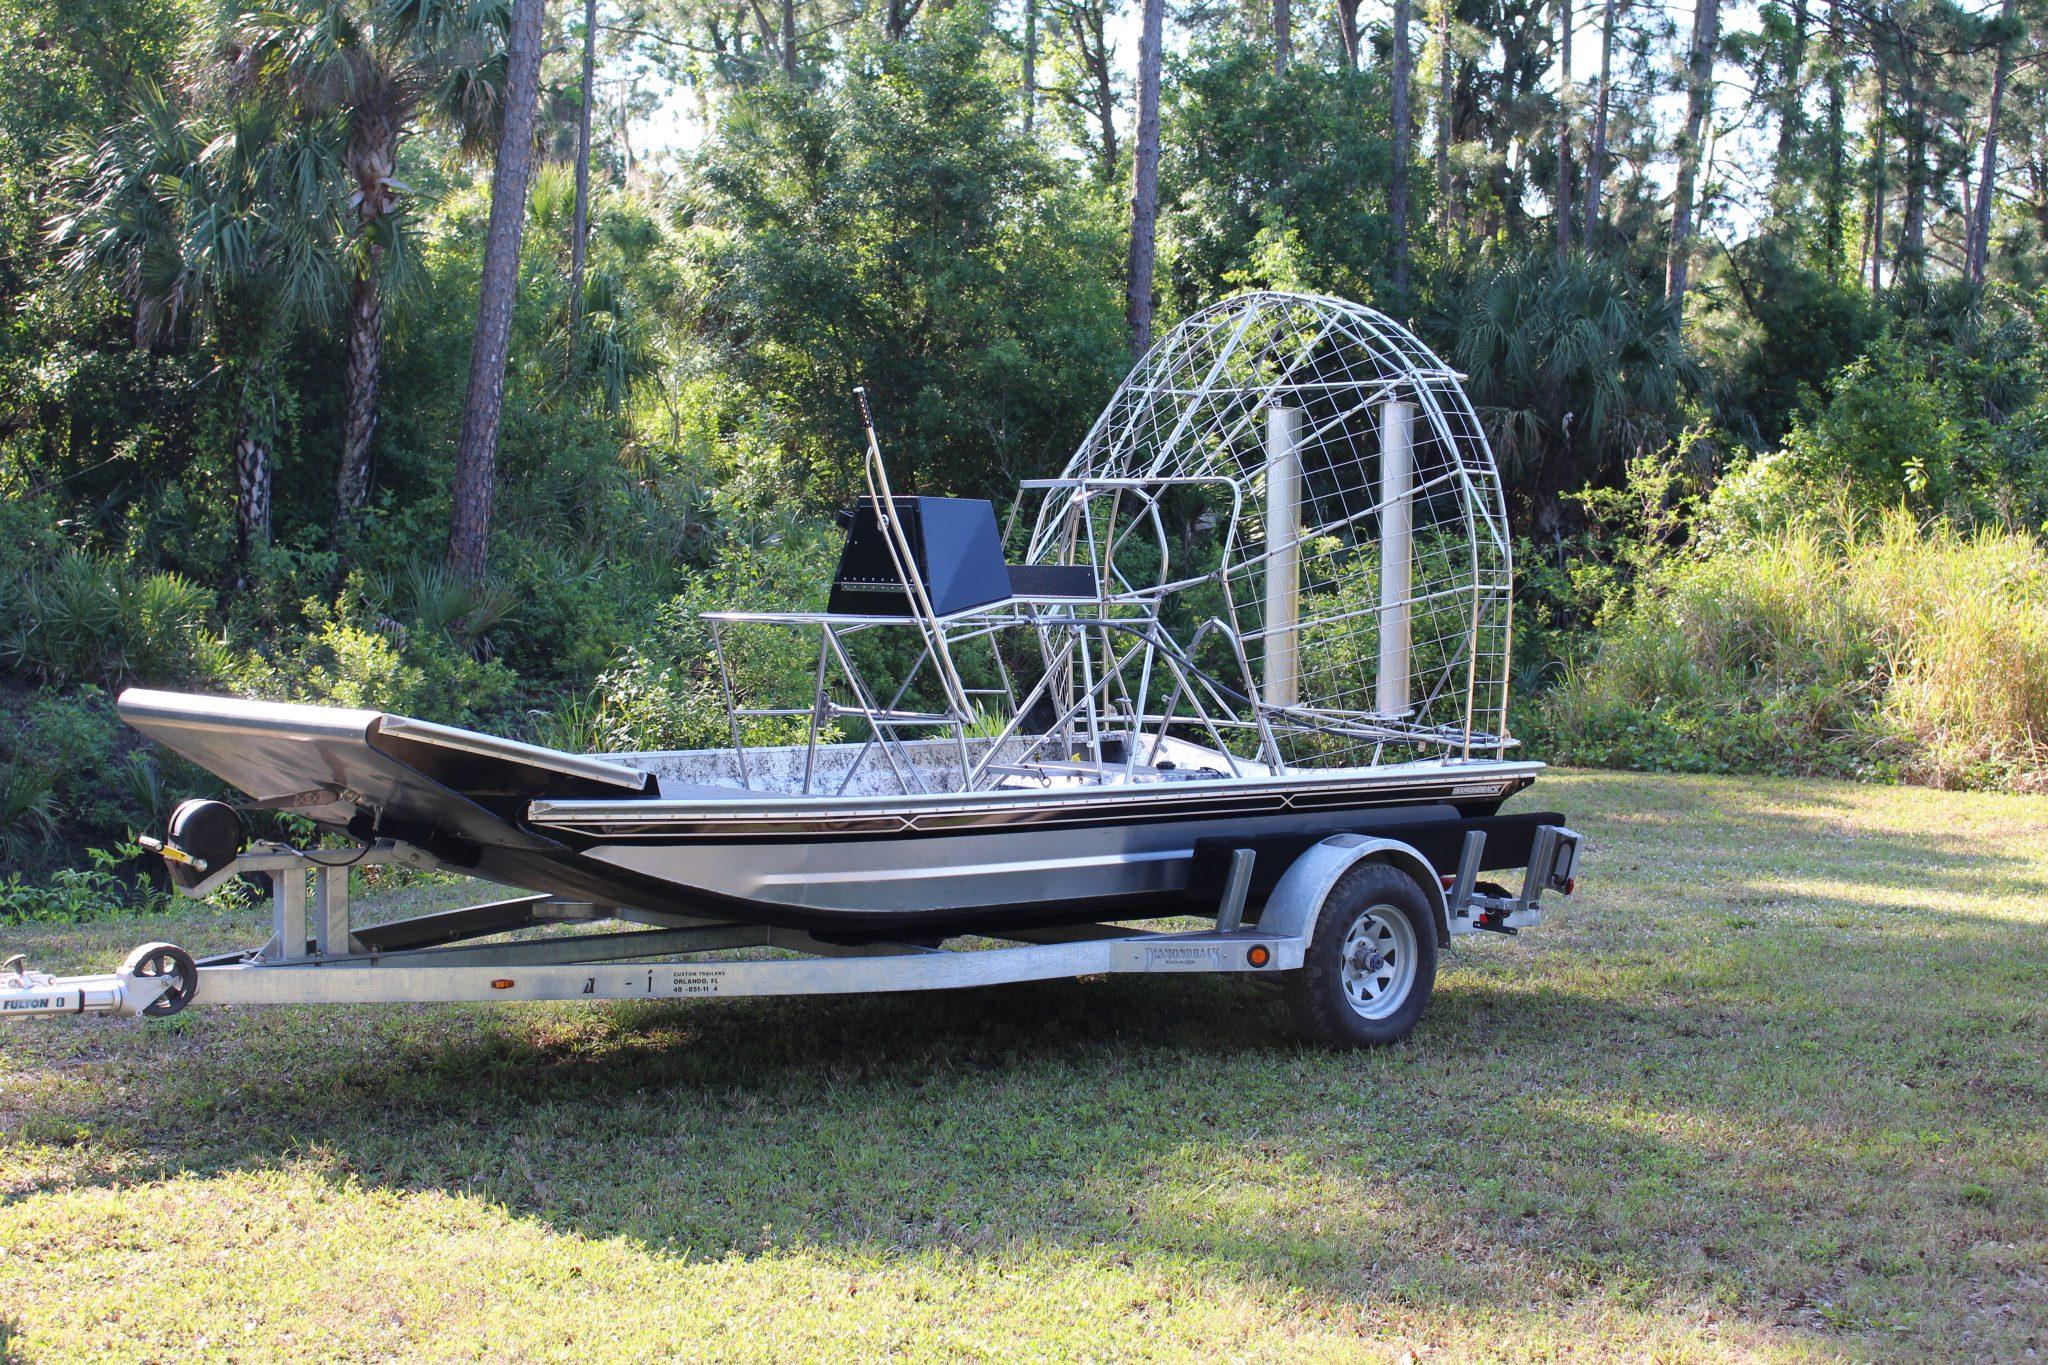 KIT BOAT 4 – Diamondback Airboats